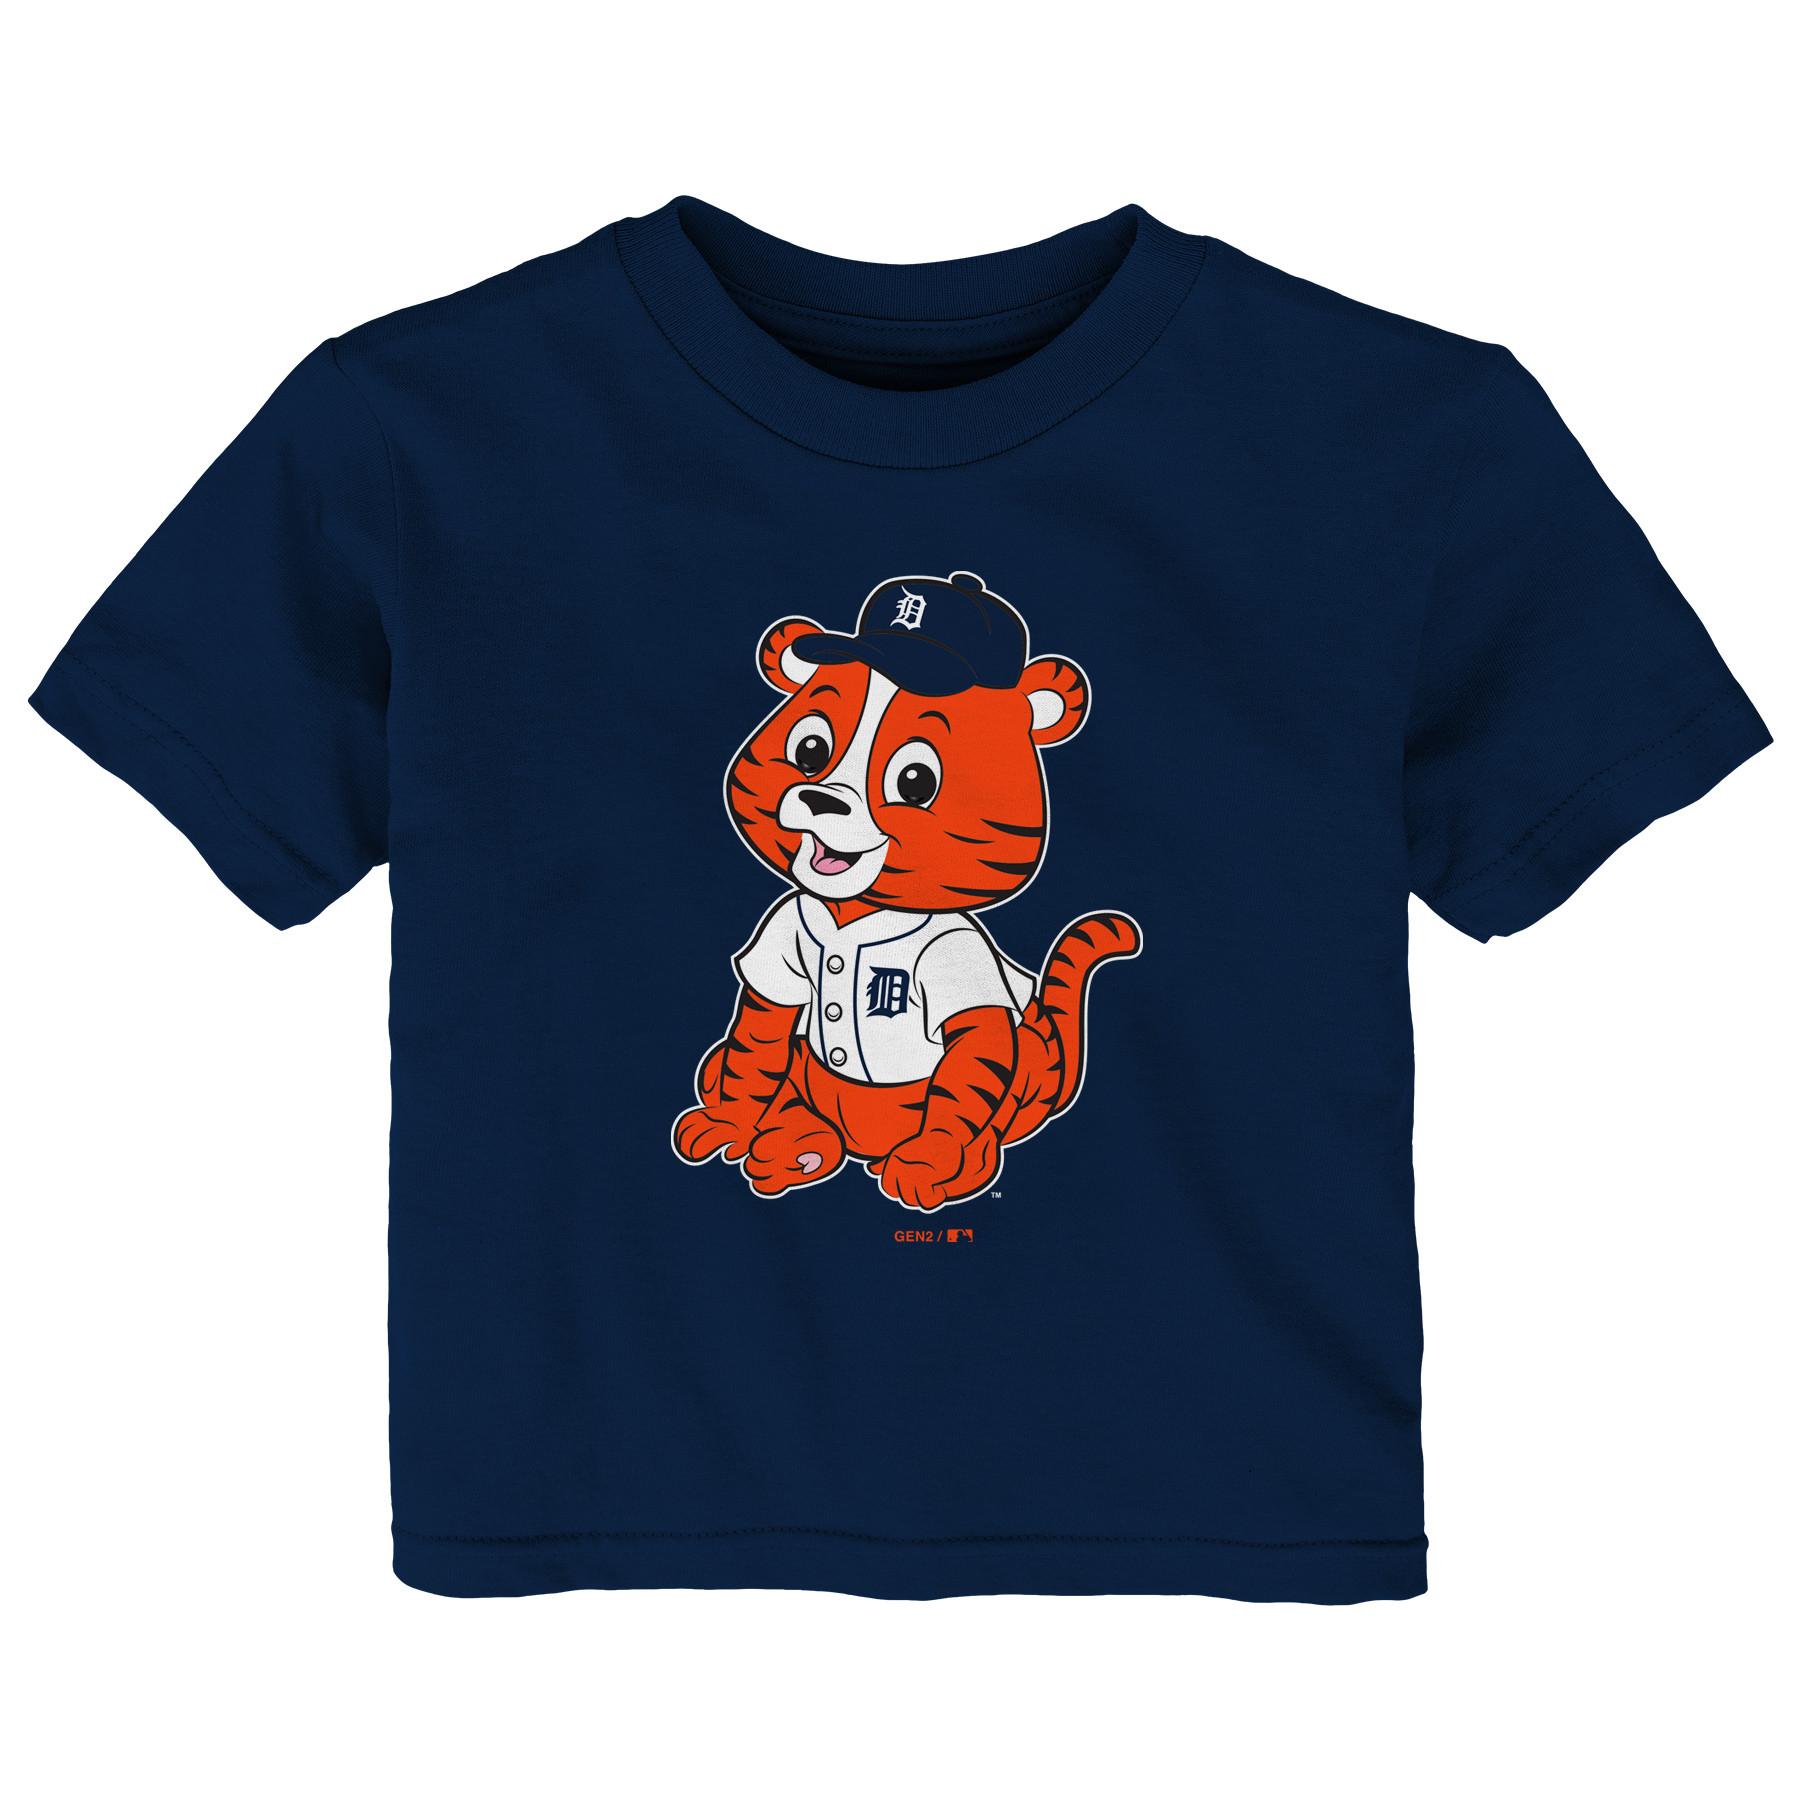 Detroit Tigers Infant Baby Mascot T-Shirt - Navy